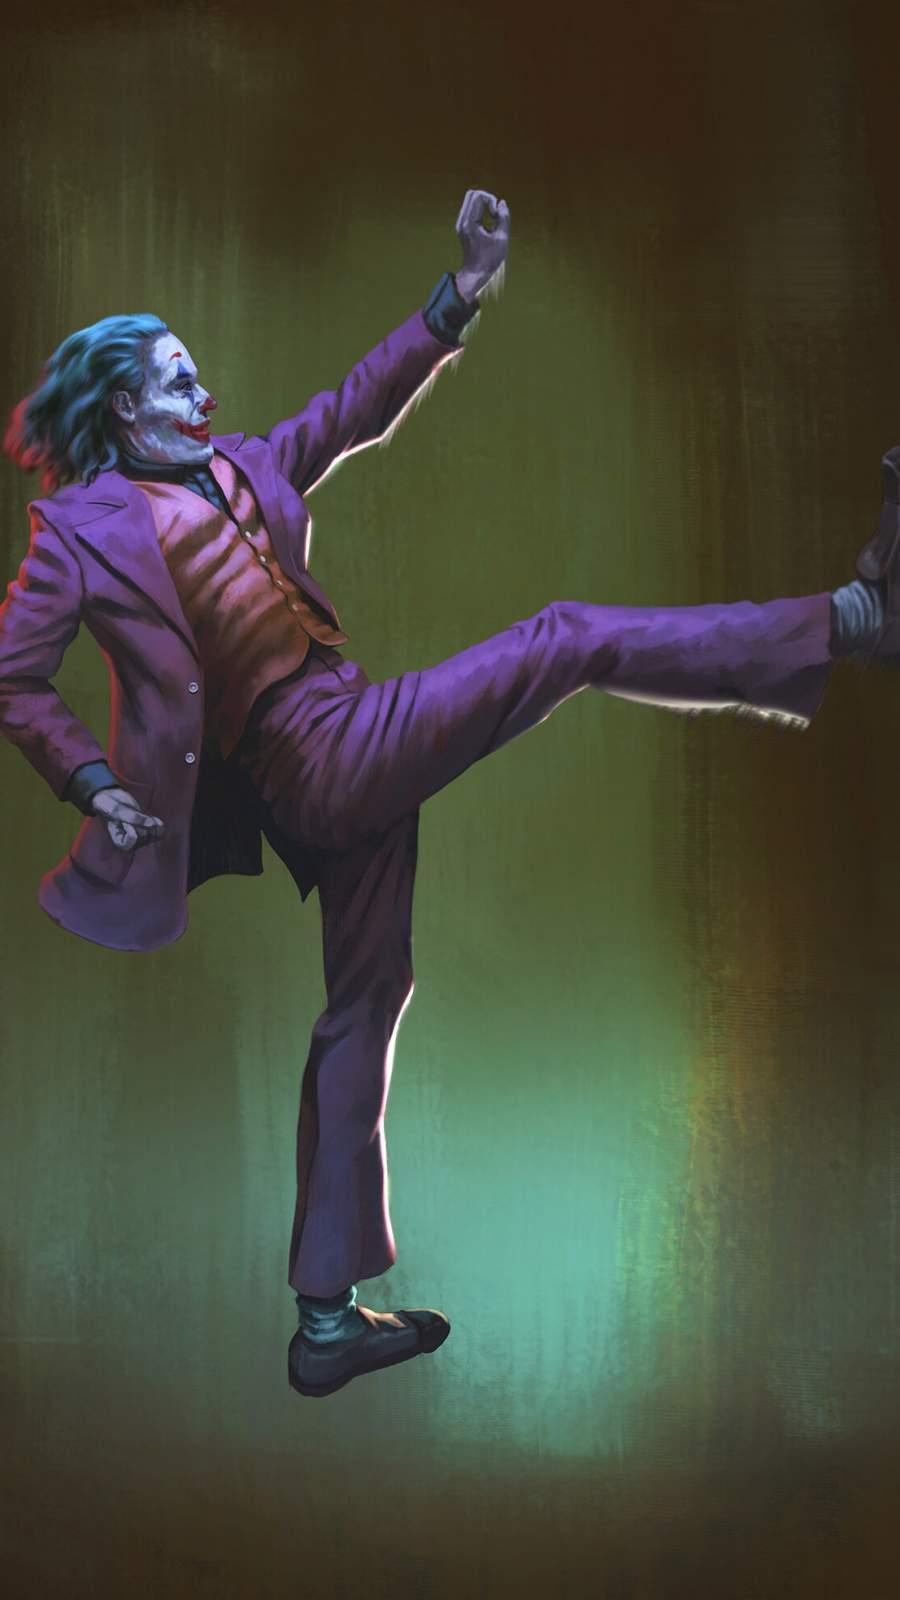 Joker Dance iPhone Wallpaper